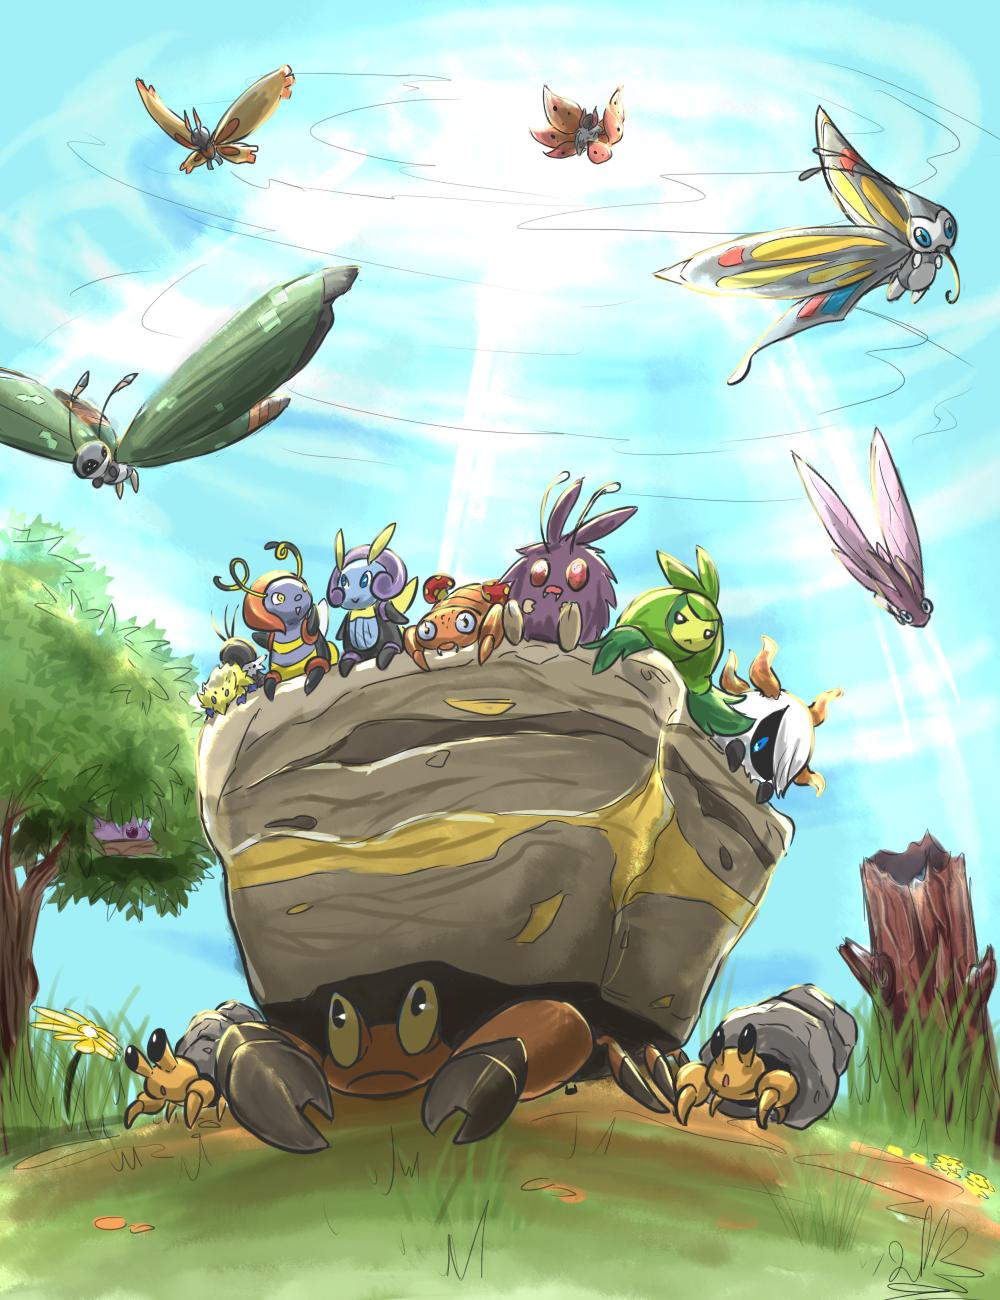 phyllocactusdraws: Do you love bug-type pokemon?   The Original Pokemon  Community!   Type pokemon, Pokemon, Pokemon images